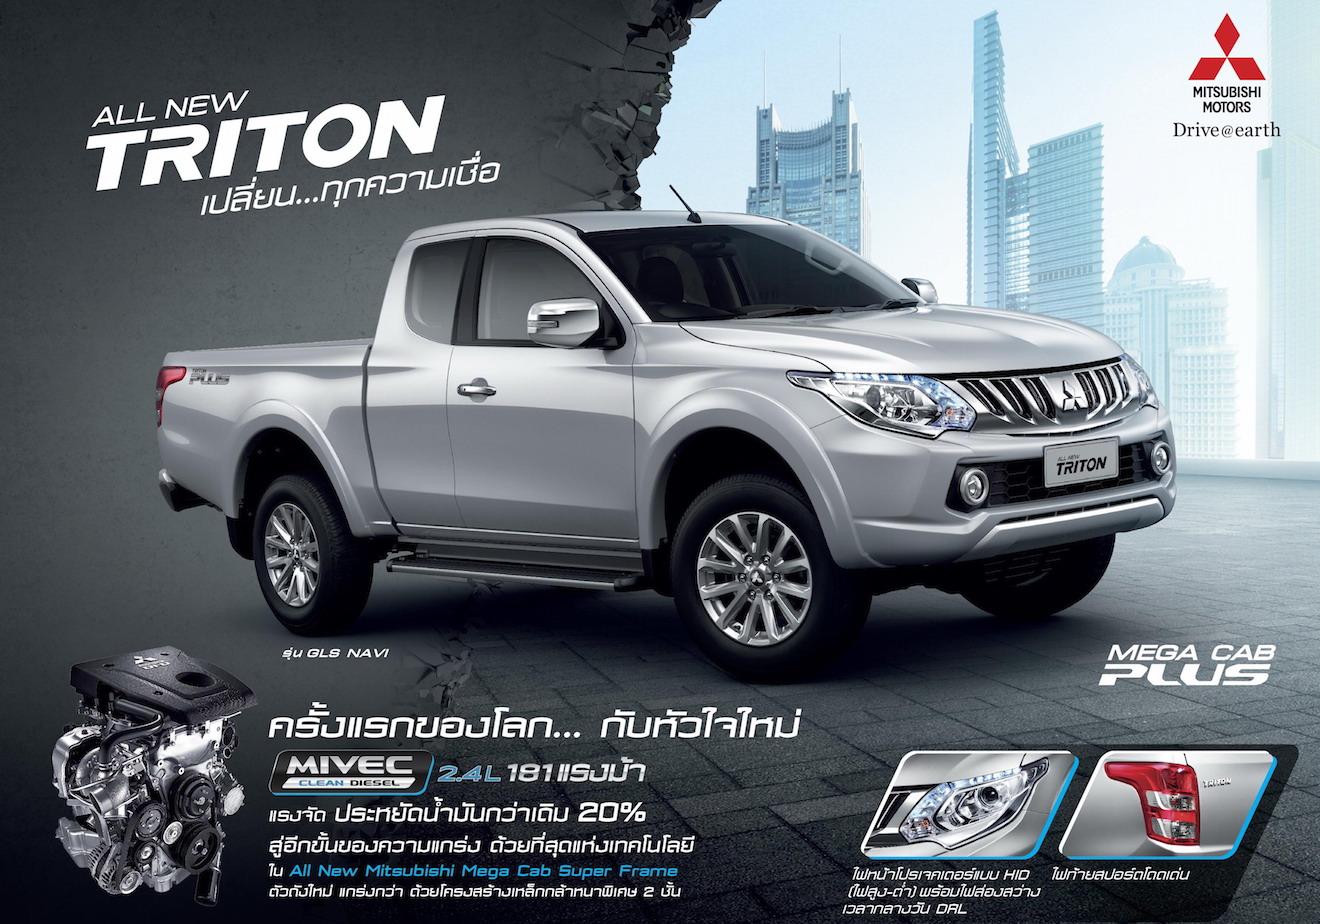 Mitsubishi Motors launches all-new Triton pick-up truck in ...